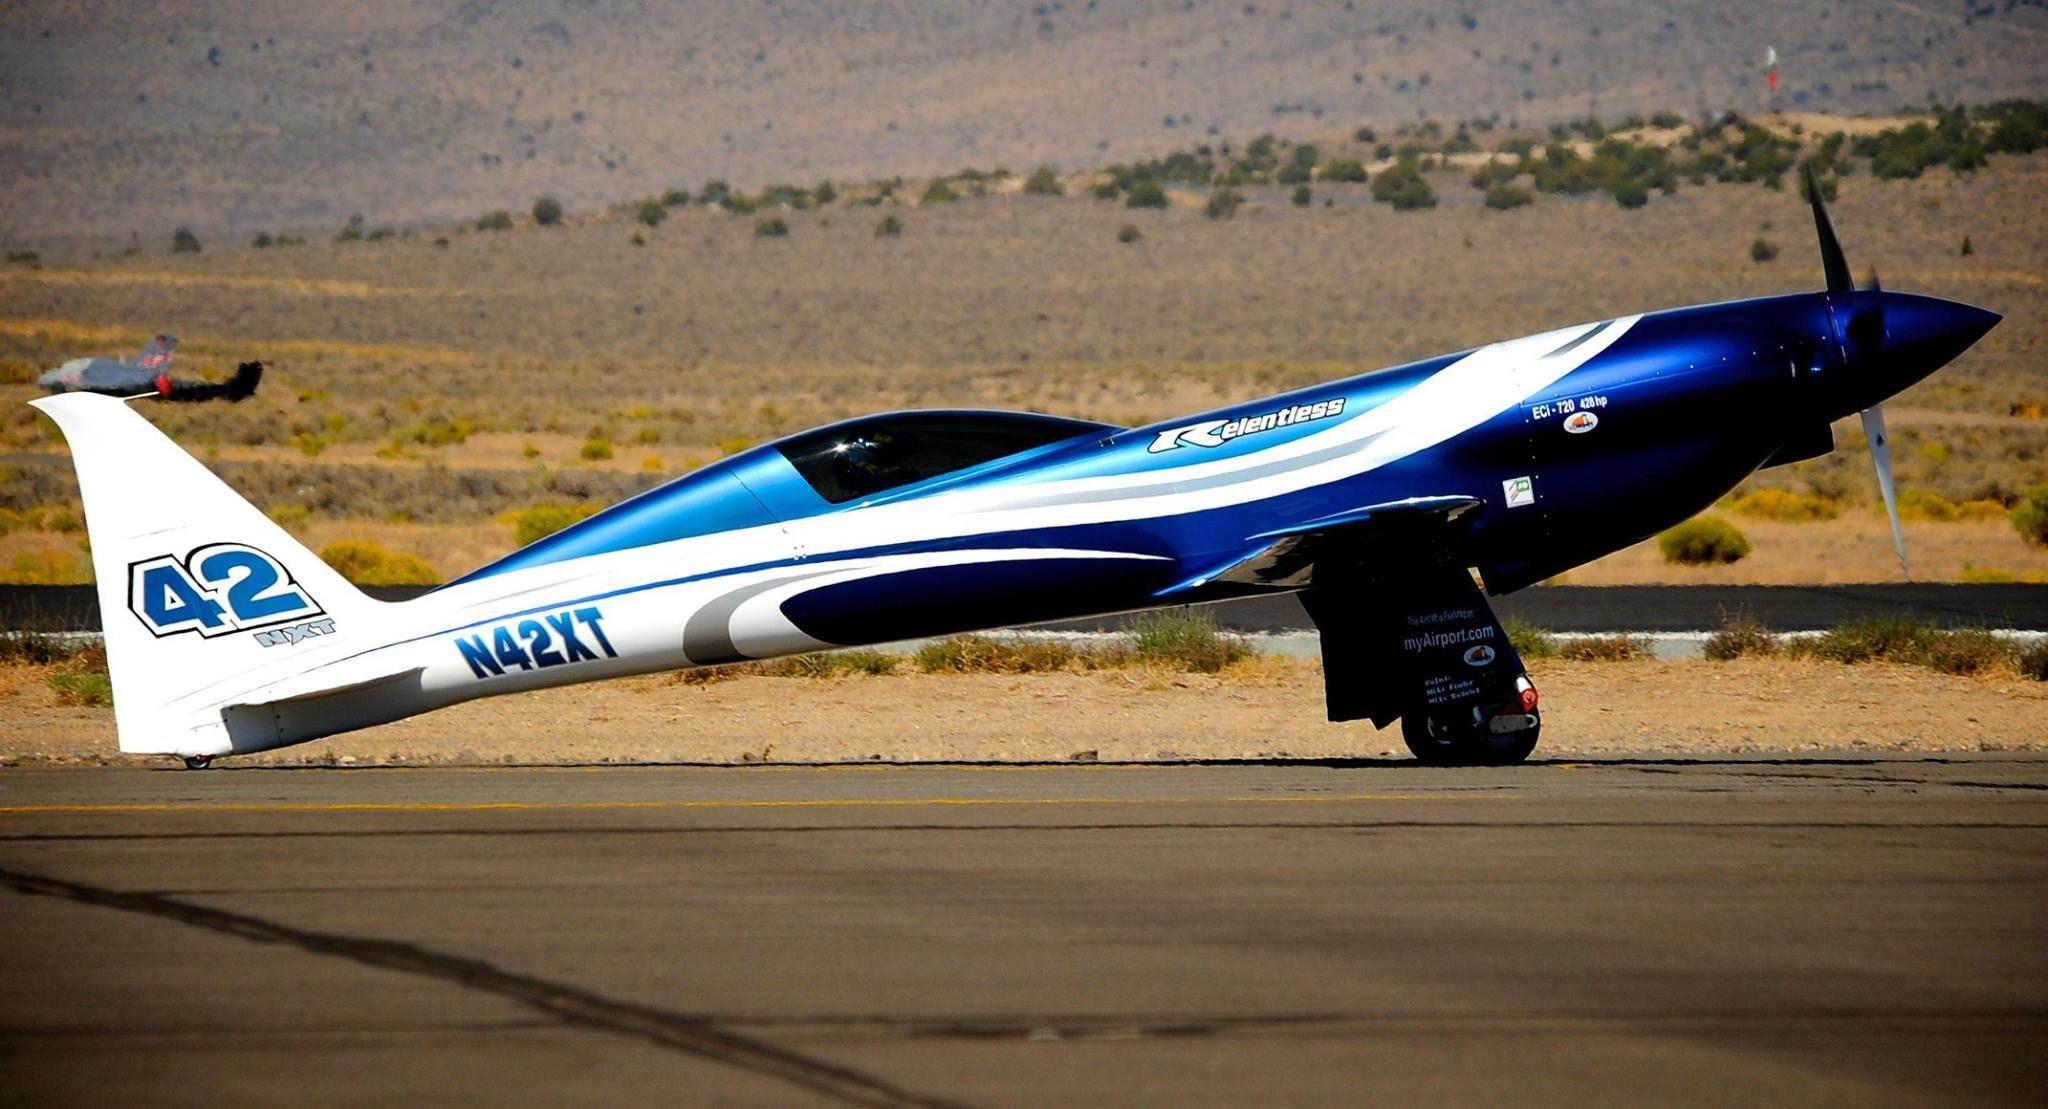 Nemesis Reno air races, Air race, Kit planes